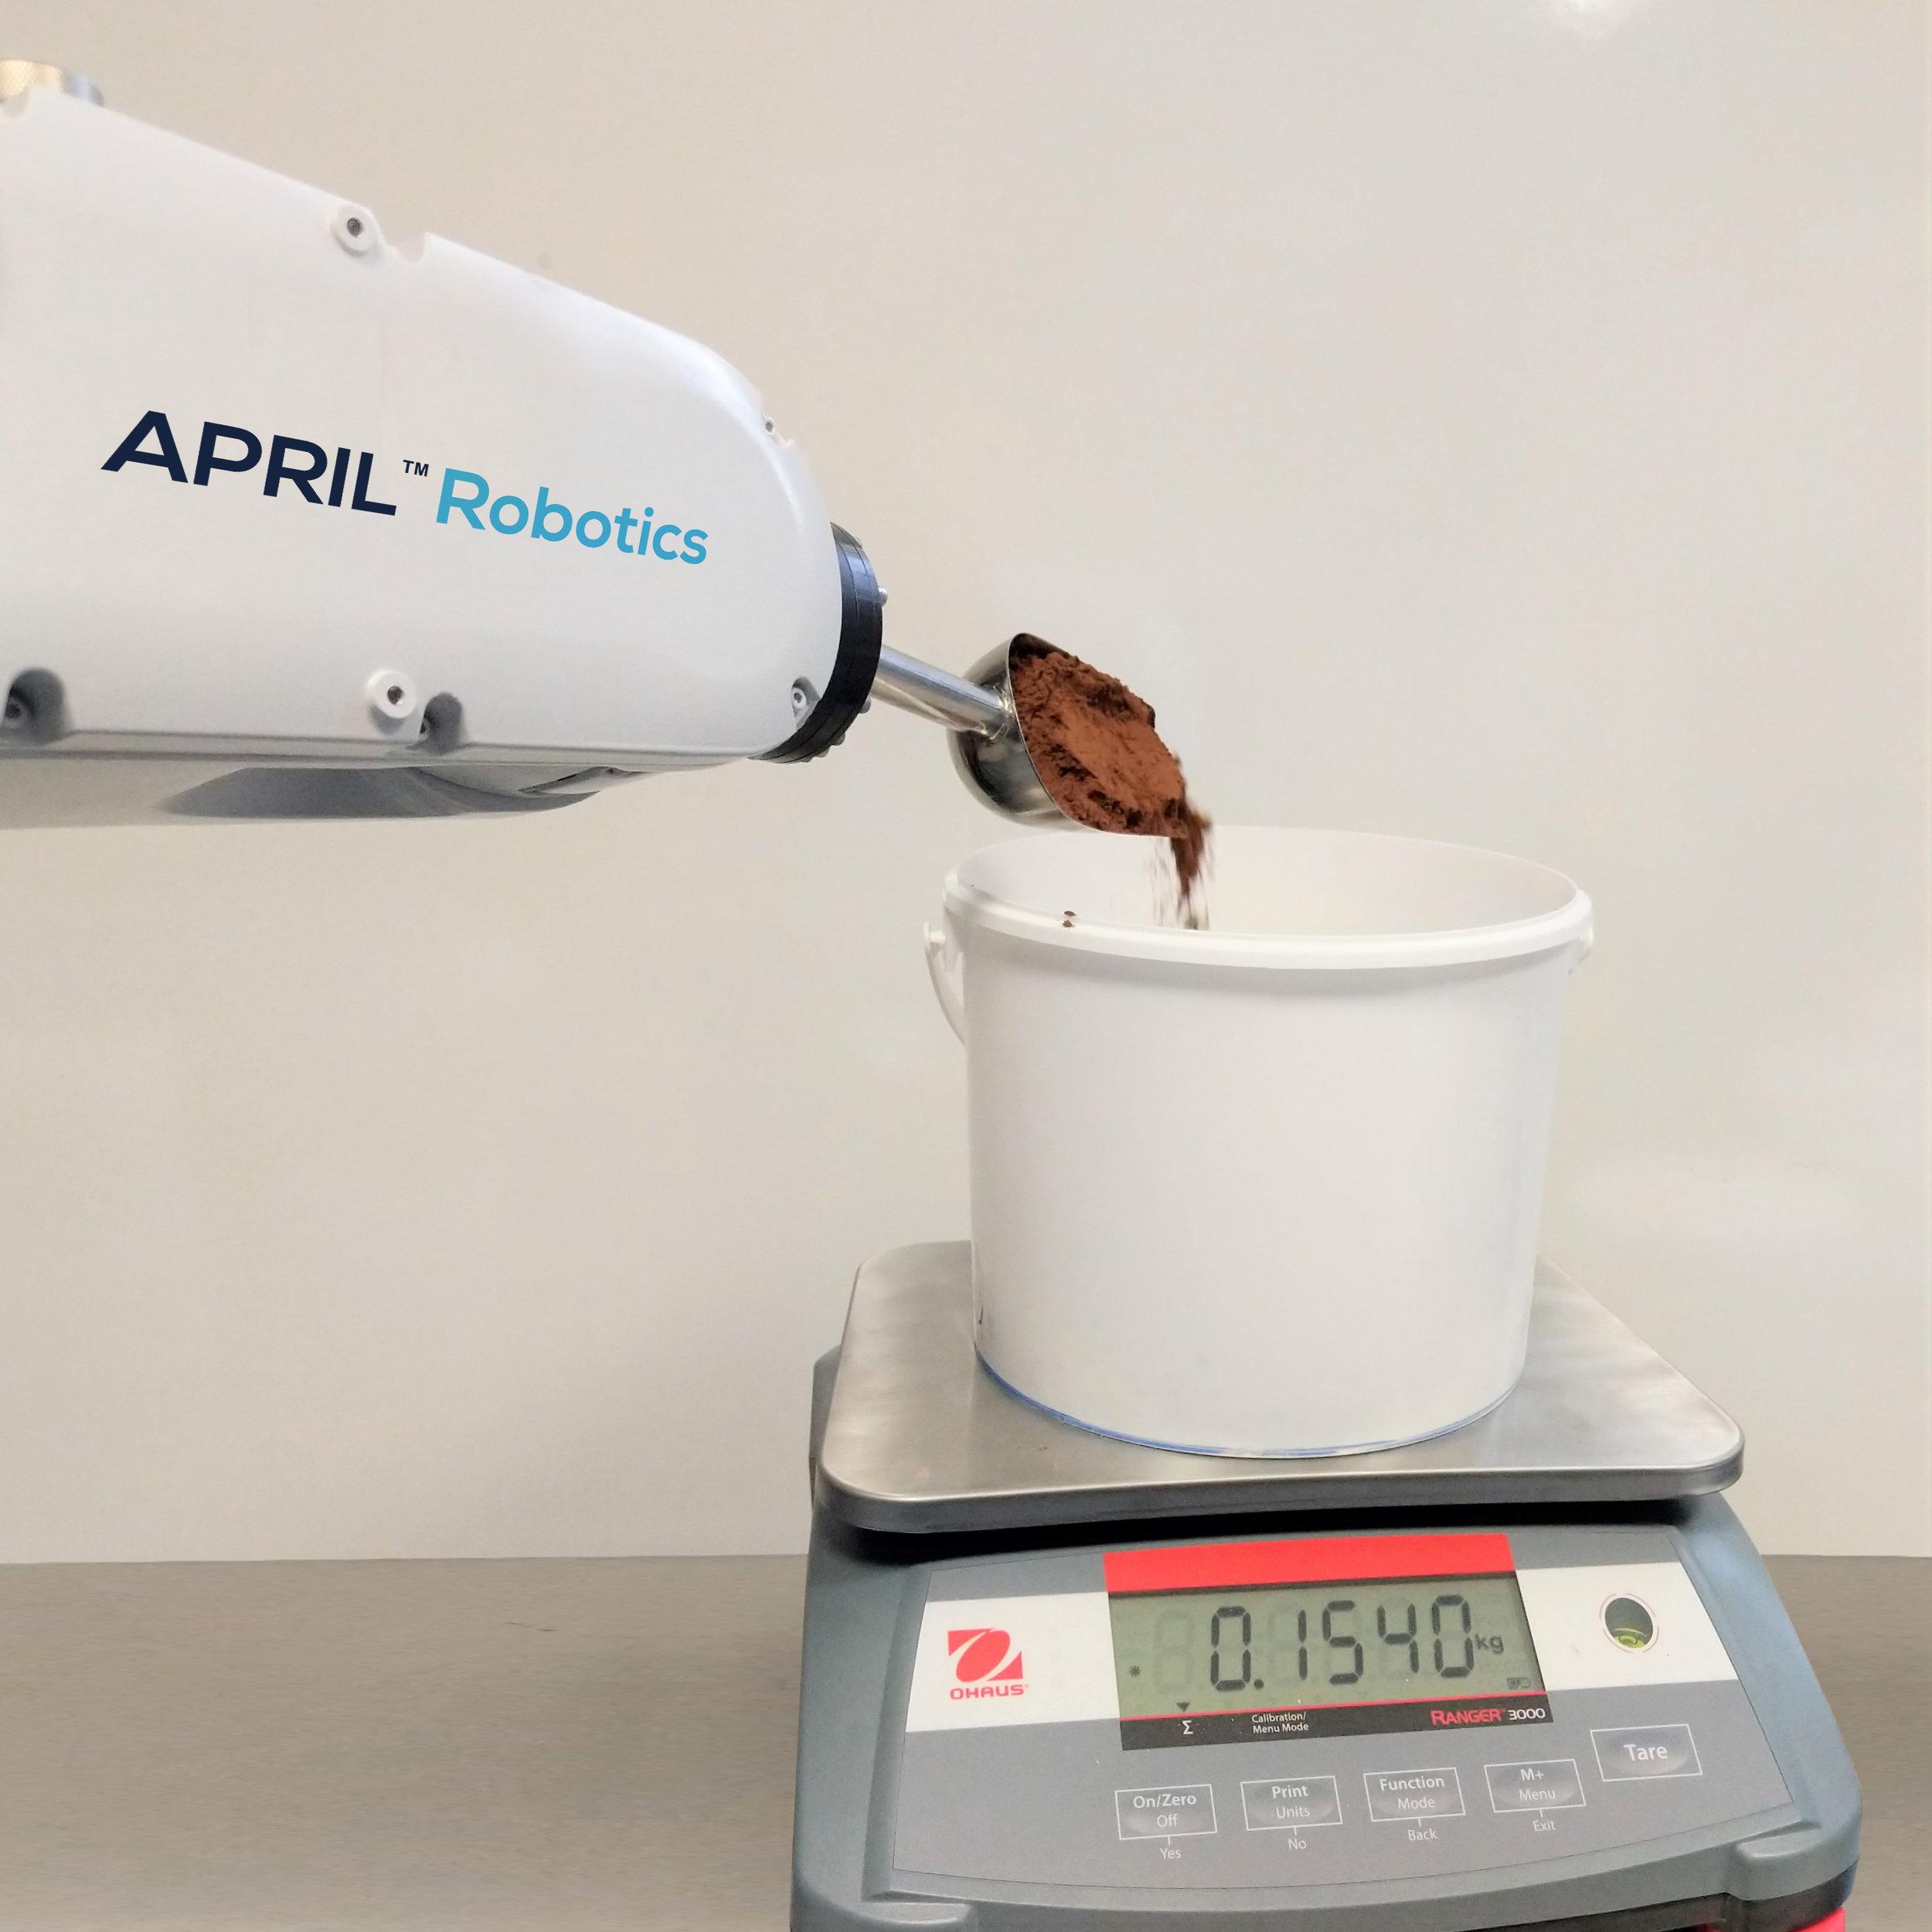 APRIL Robotics Weighing Cocoa High Res.jpg